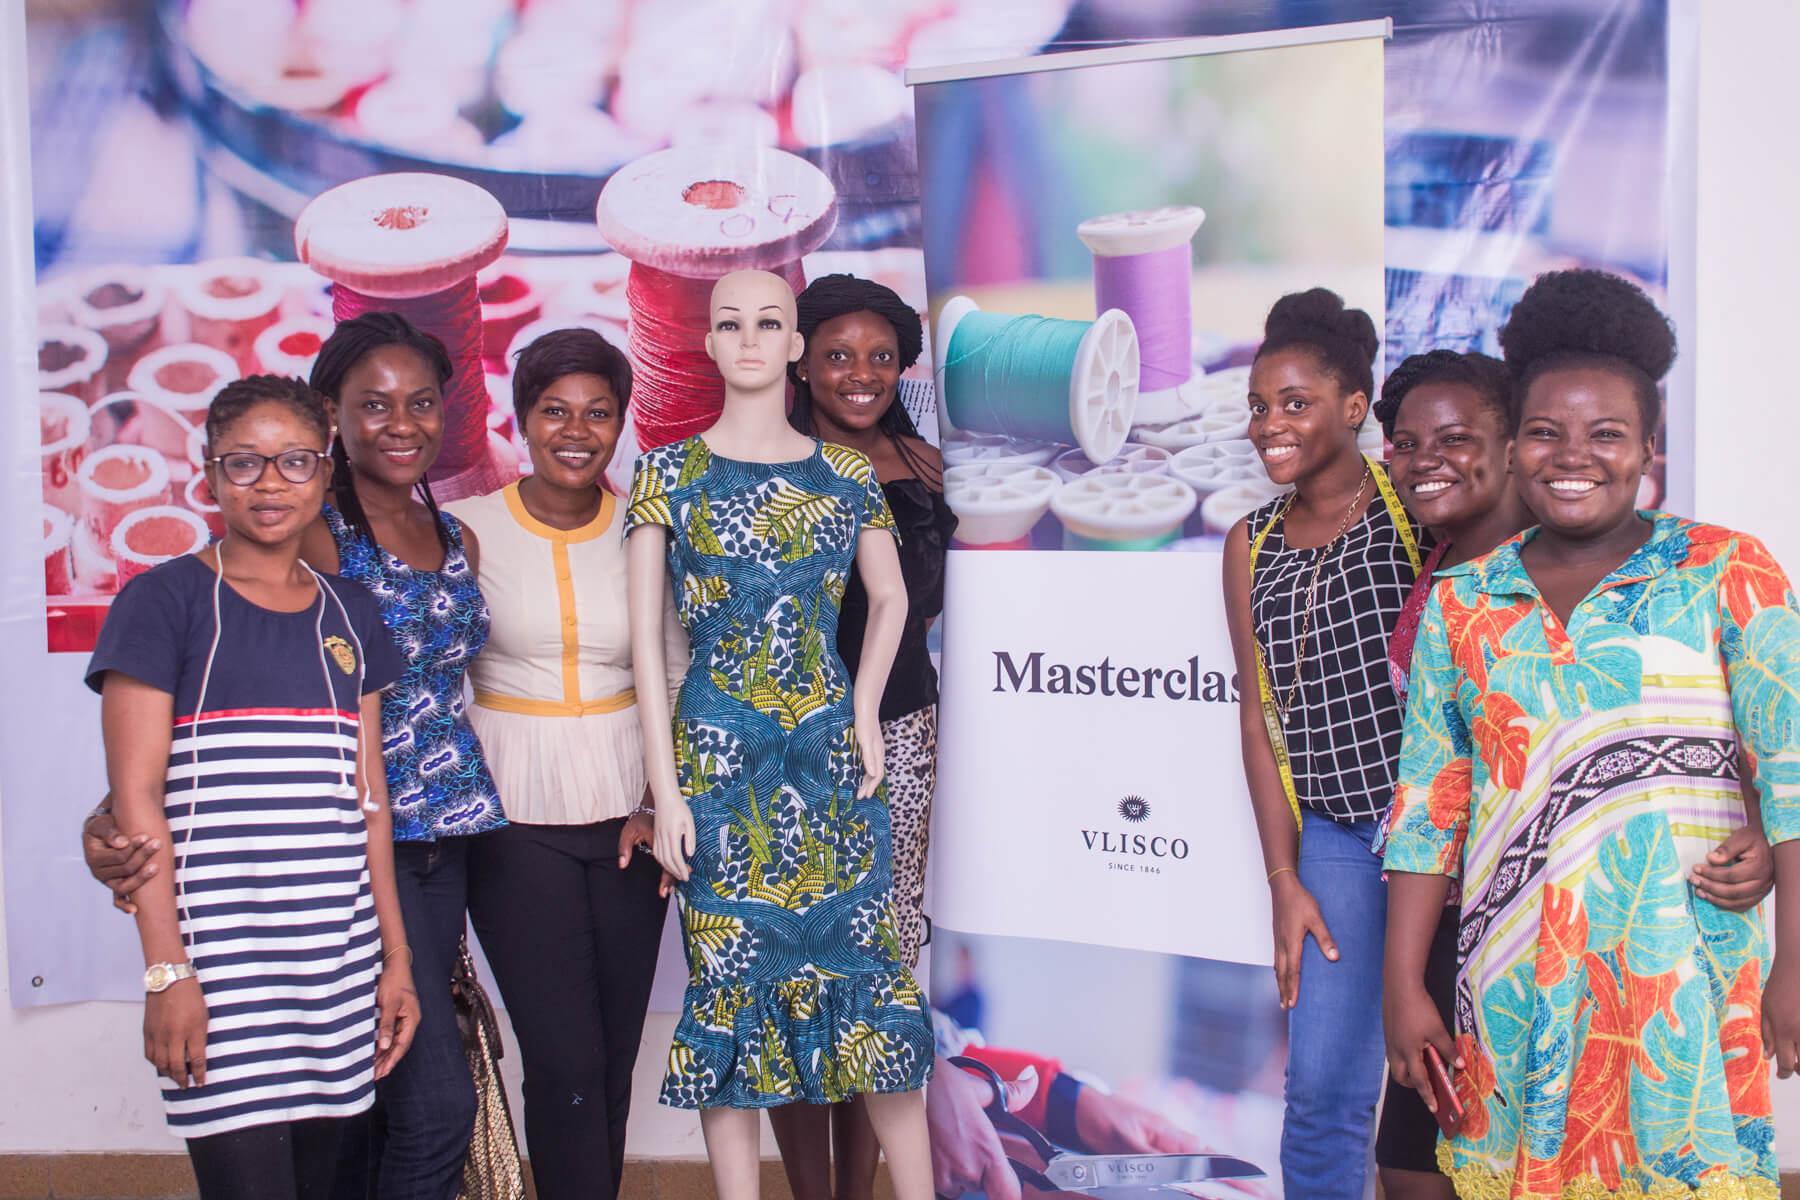 Vlisco Masterclass Nigeria